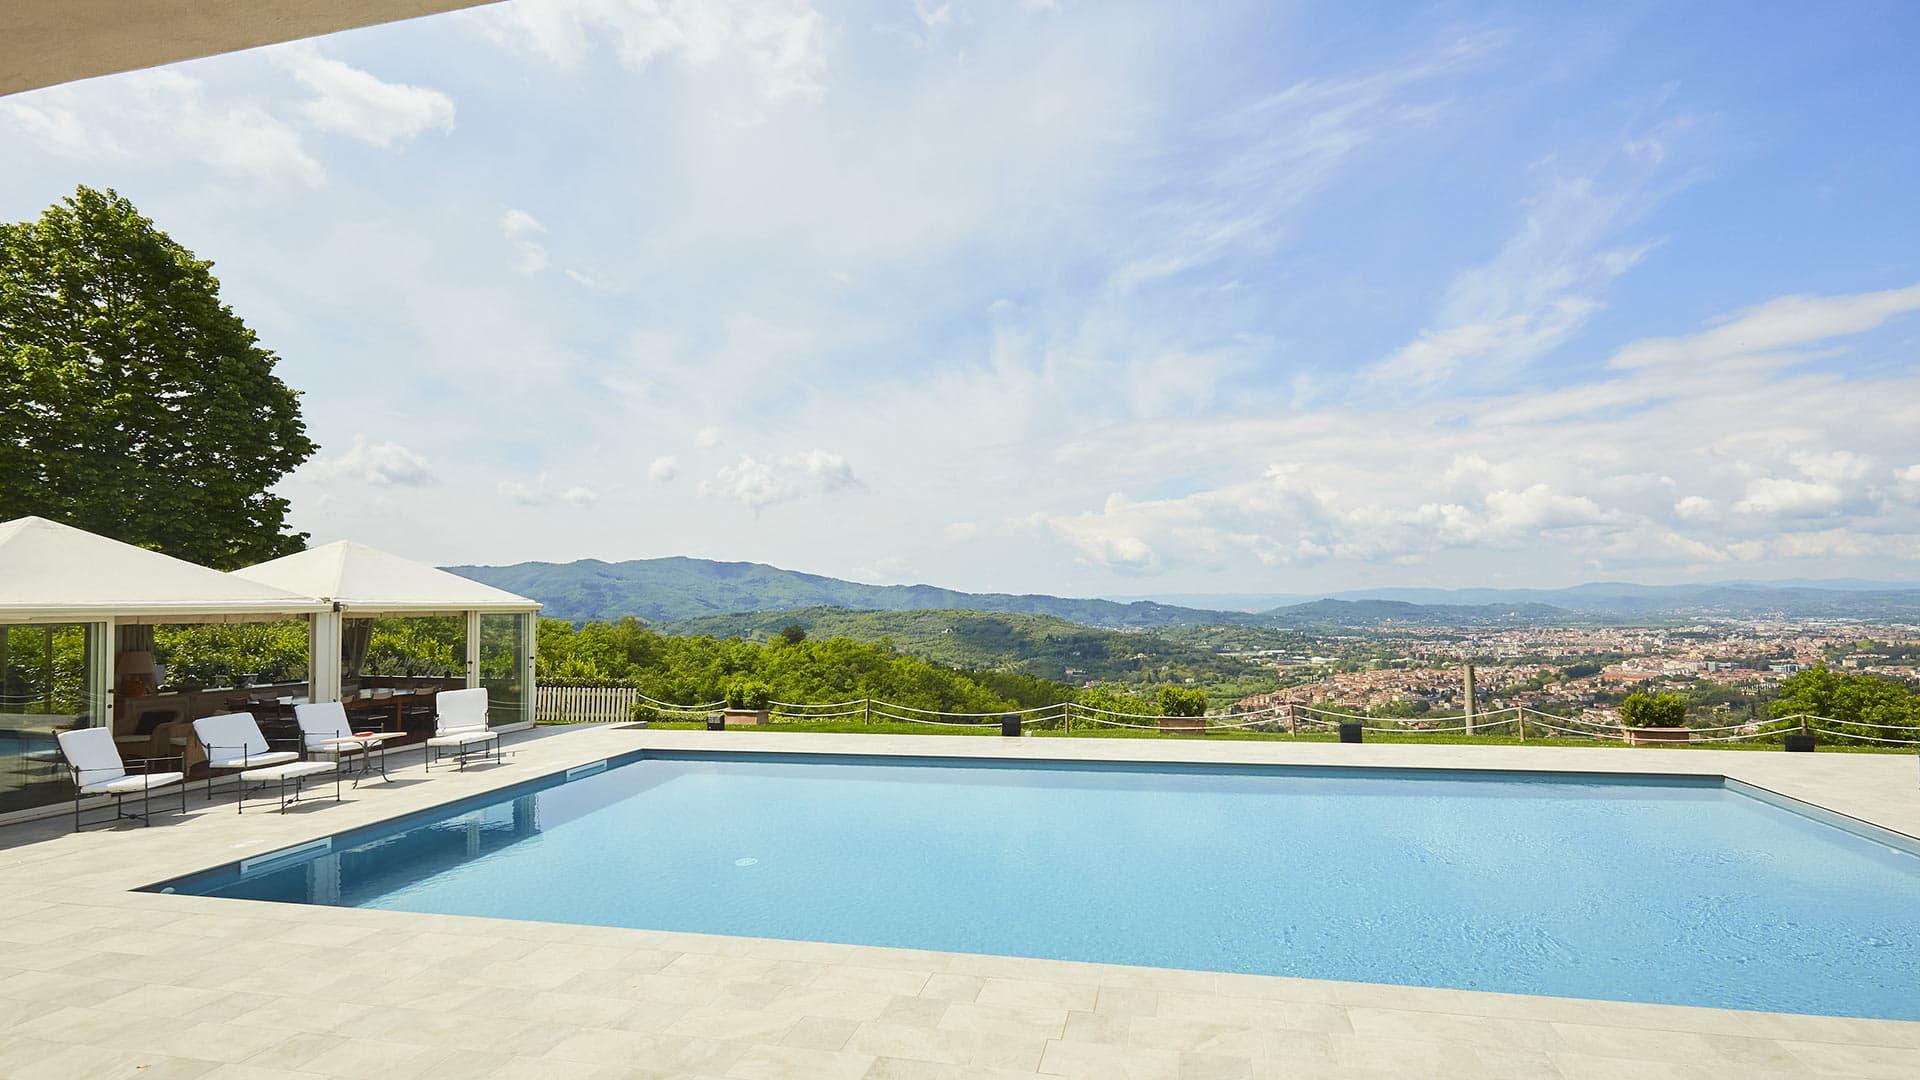 Villa Villa Christine, Rental in Tuscany